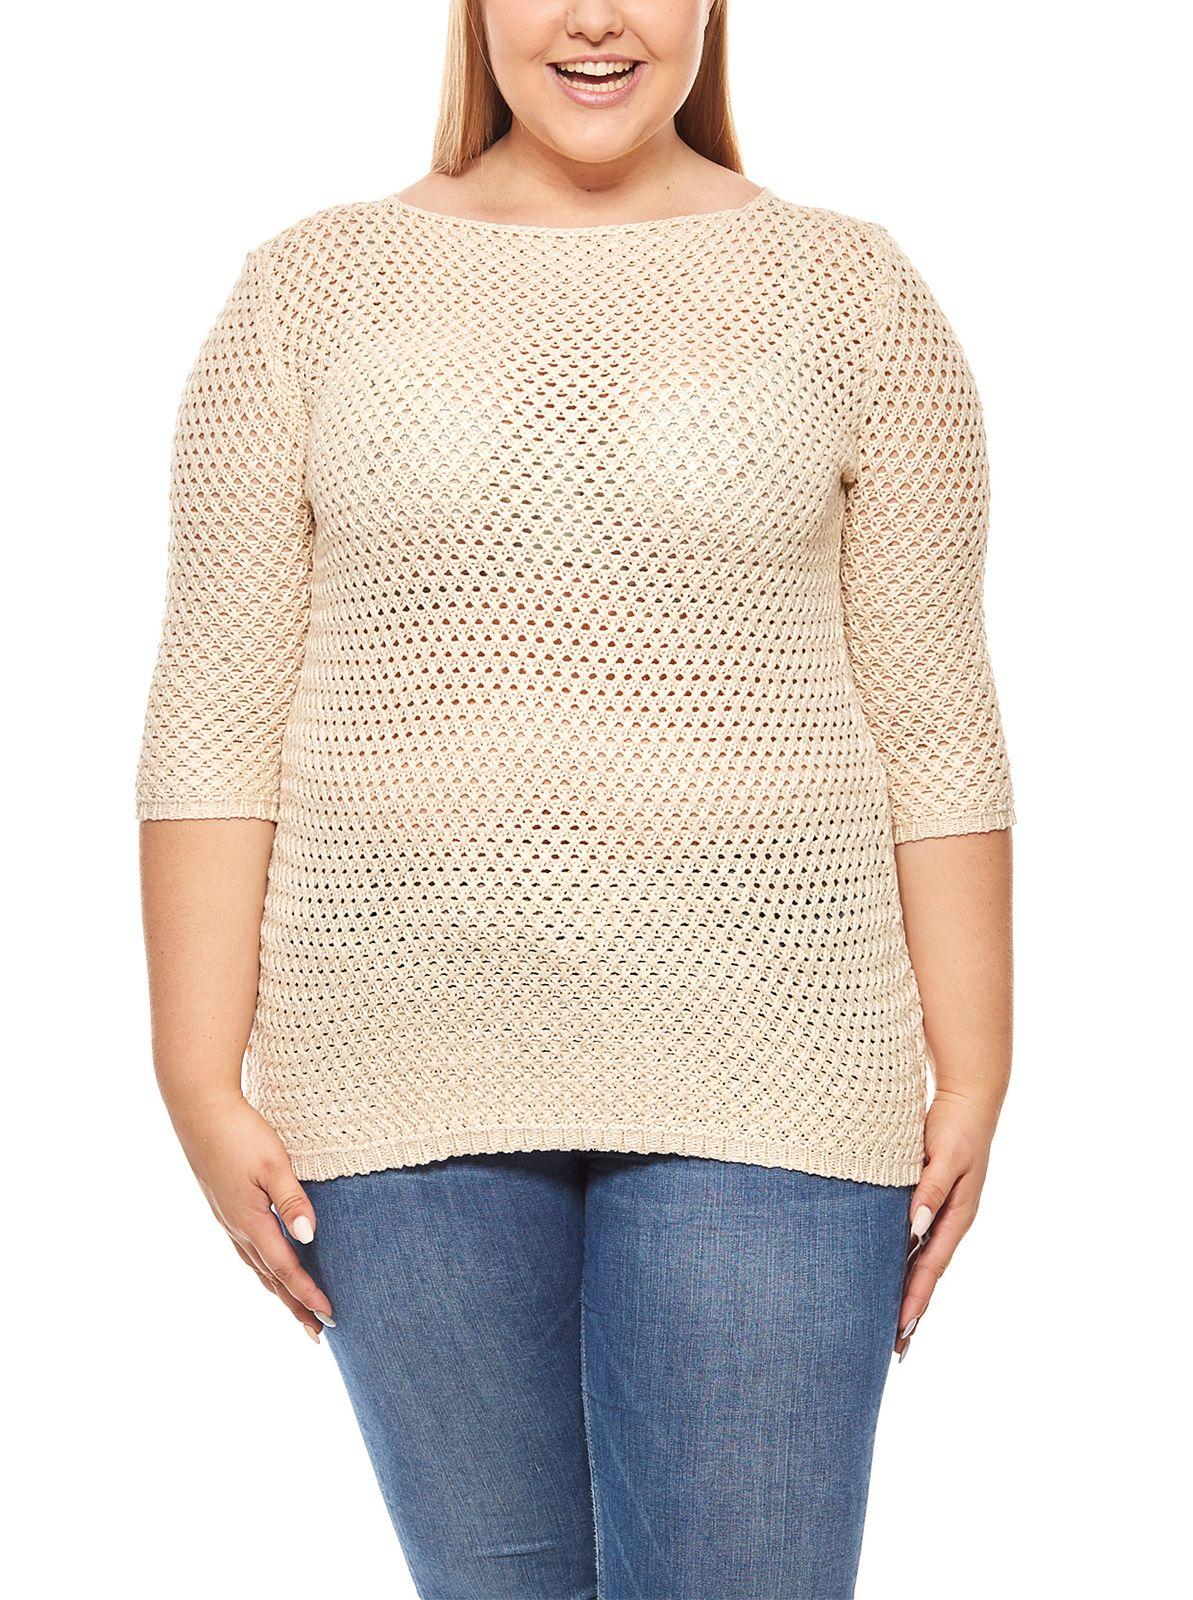 Damen 3 4 Pullover Große Größen Beige ashley brooke eb599dd9f5